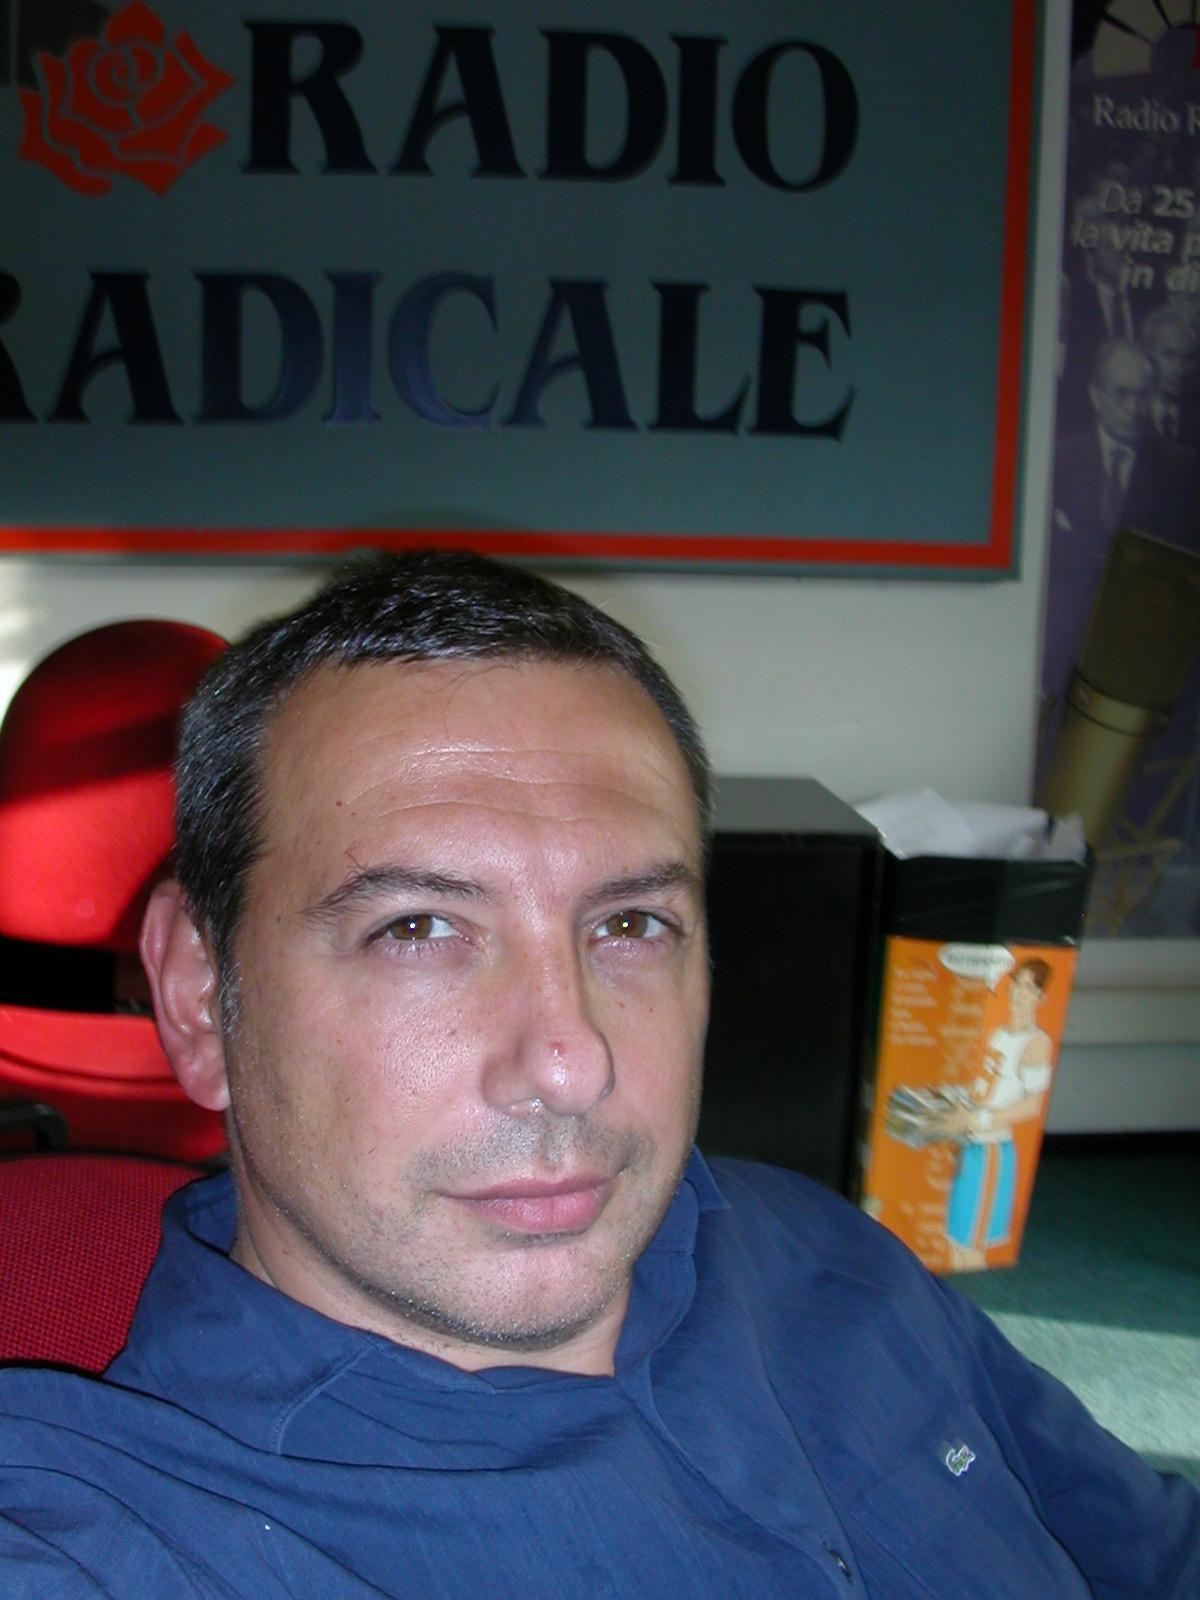 Lanfranco palazzolo 6 giu 2012 for Diretta radio radicale